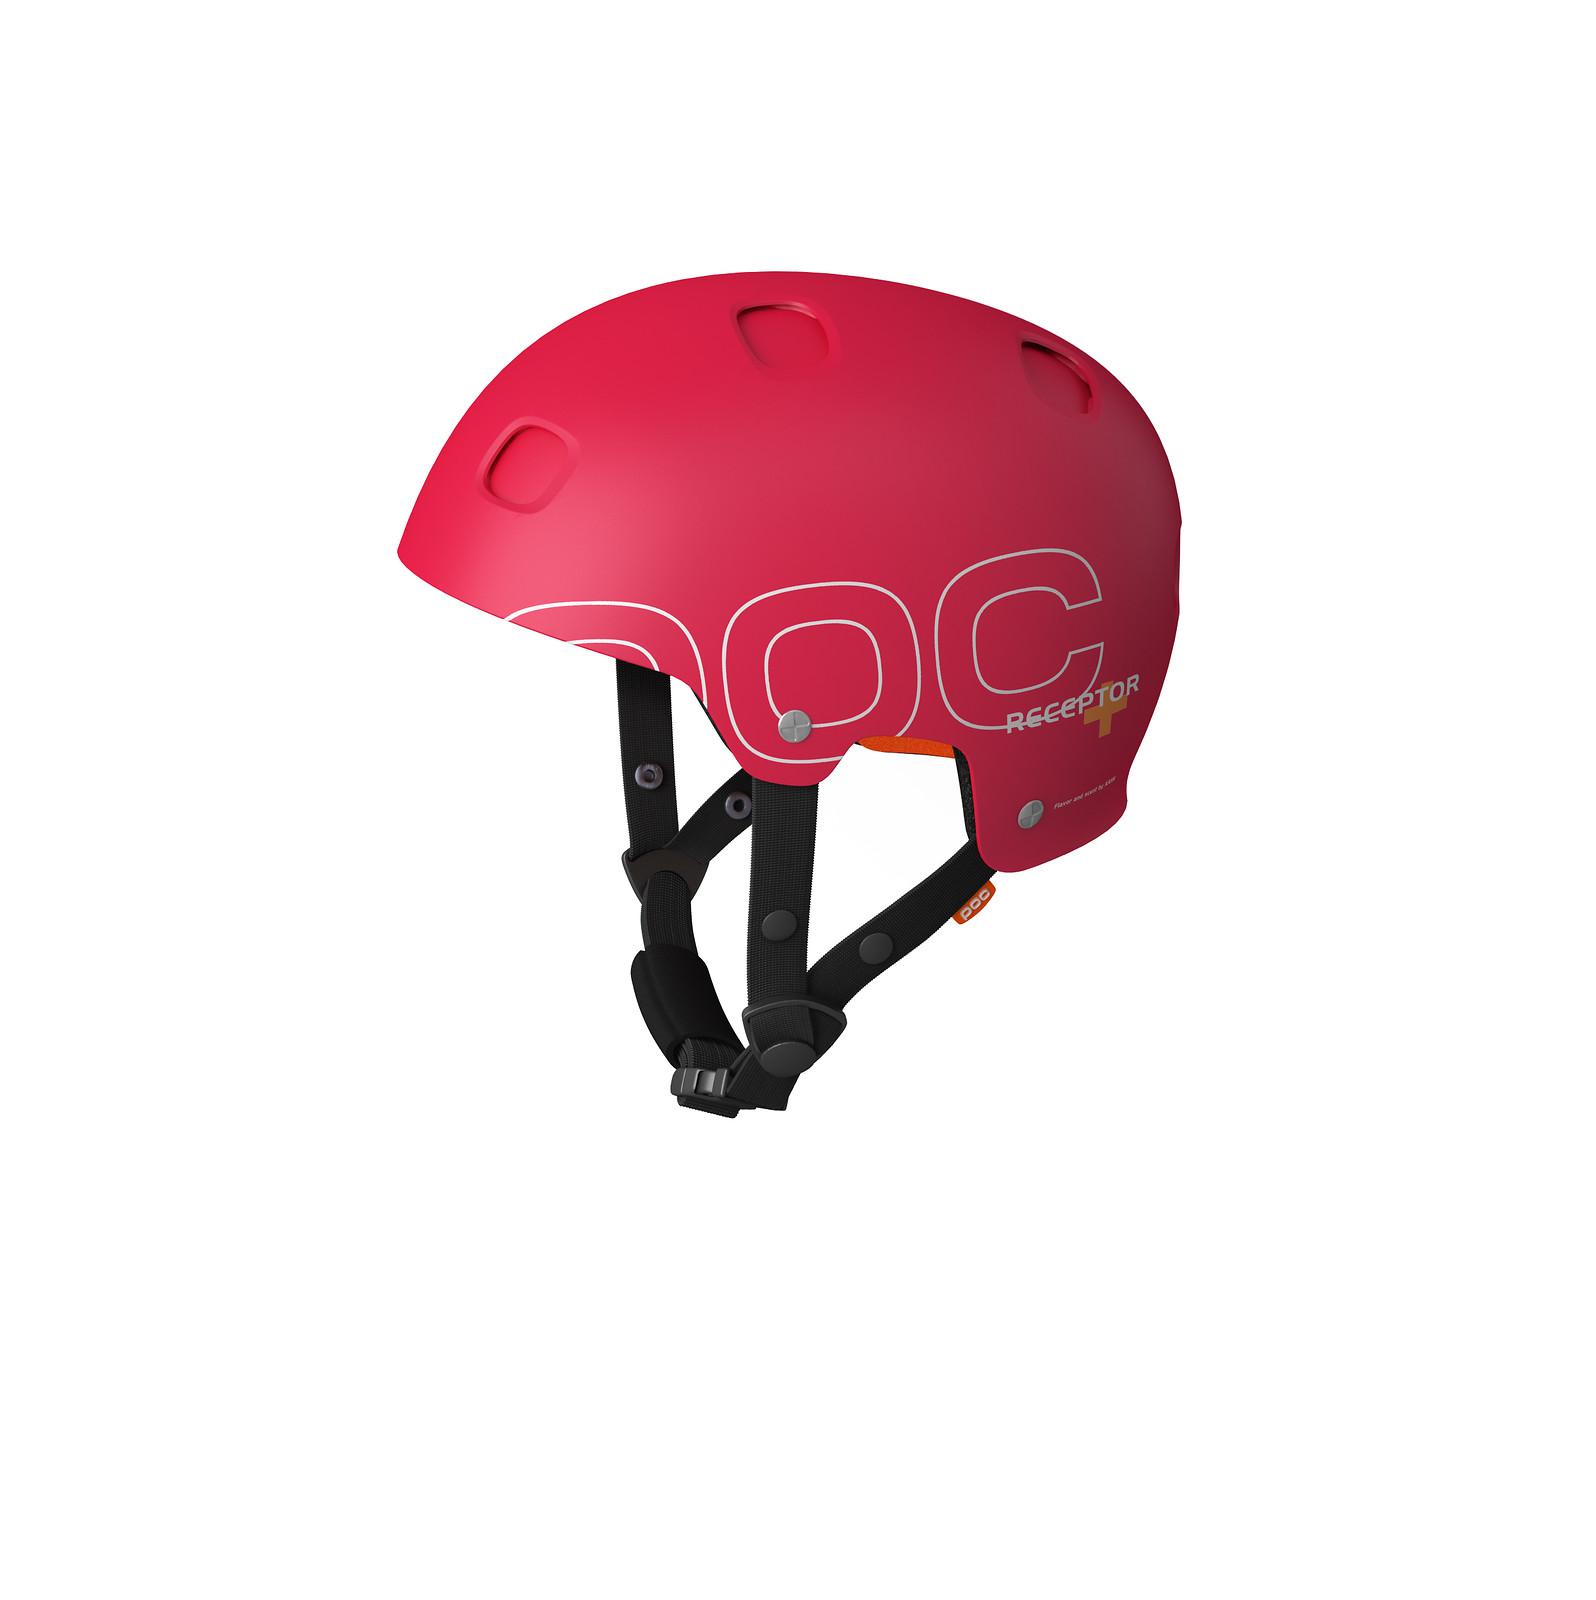 POC Receptor + Open Face Helmet Receptor+_Red_27